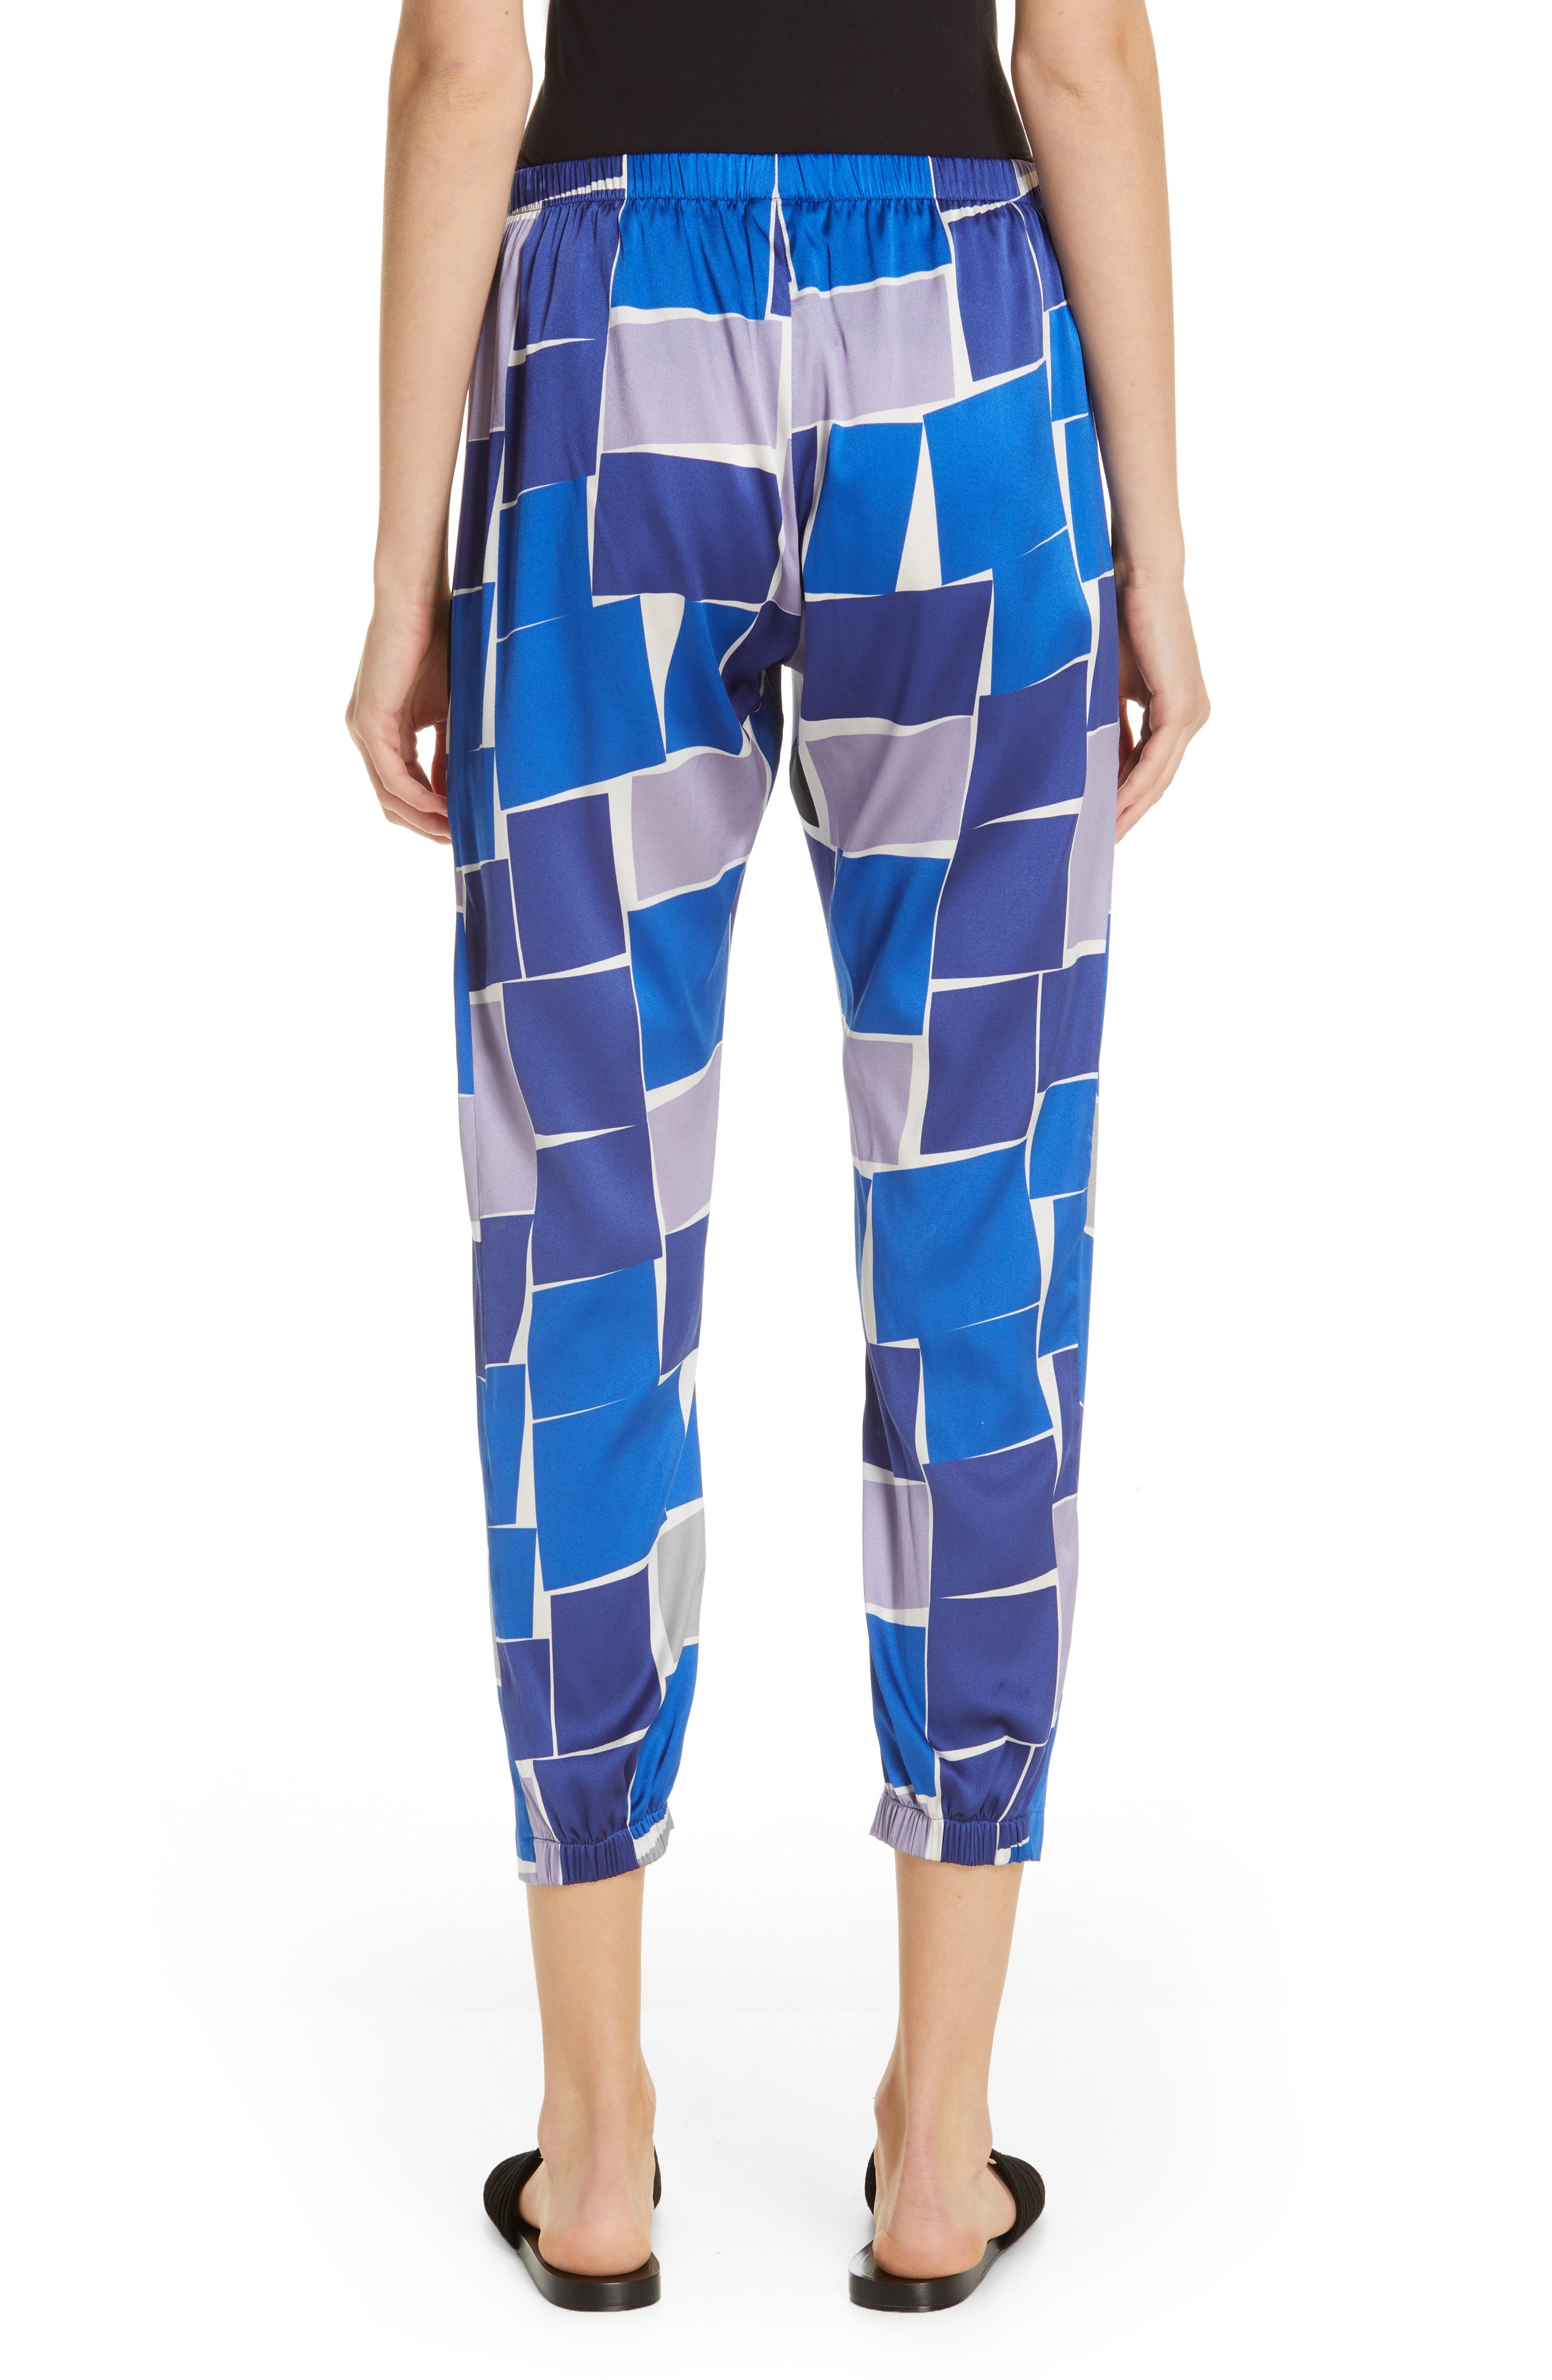 ZERO + MARIA CORNEJO, Gabi Print Stretch Silk Trousers, Alternate thumbnail 2, color, DUSK MULTI